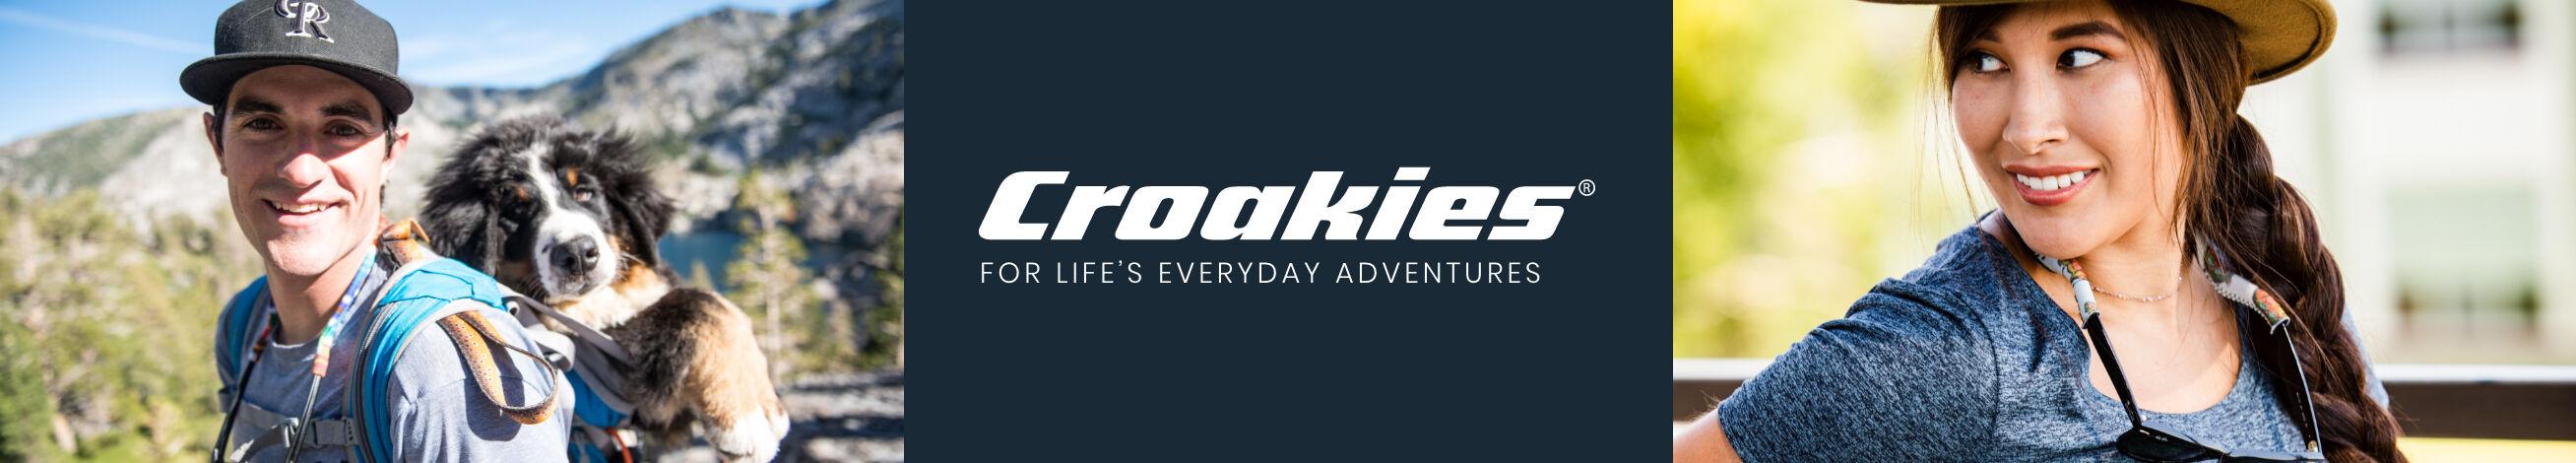 croakies-retainers-cat-banner